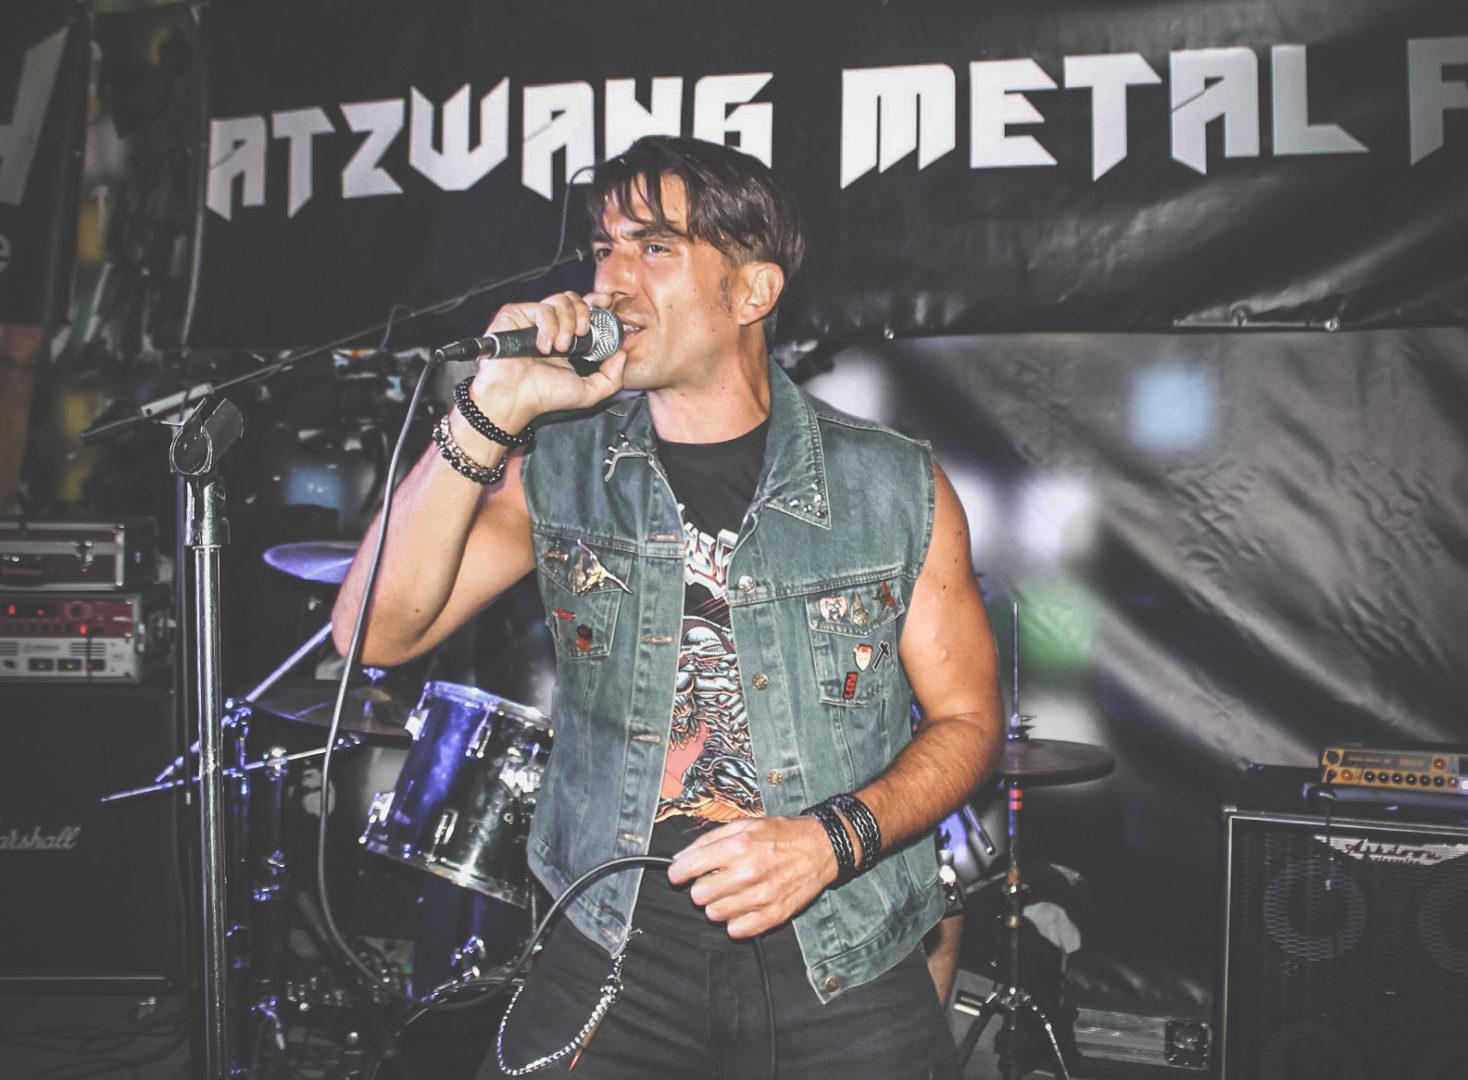 Anguish Force Atzwang Metal Fest 2019 29 - Atzwang Metal Fest 9 - live